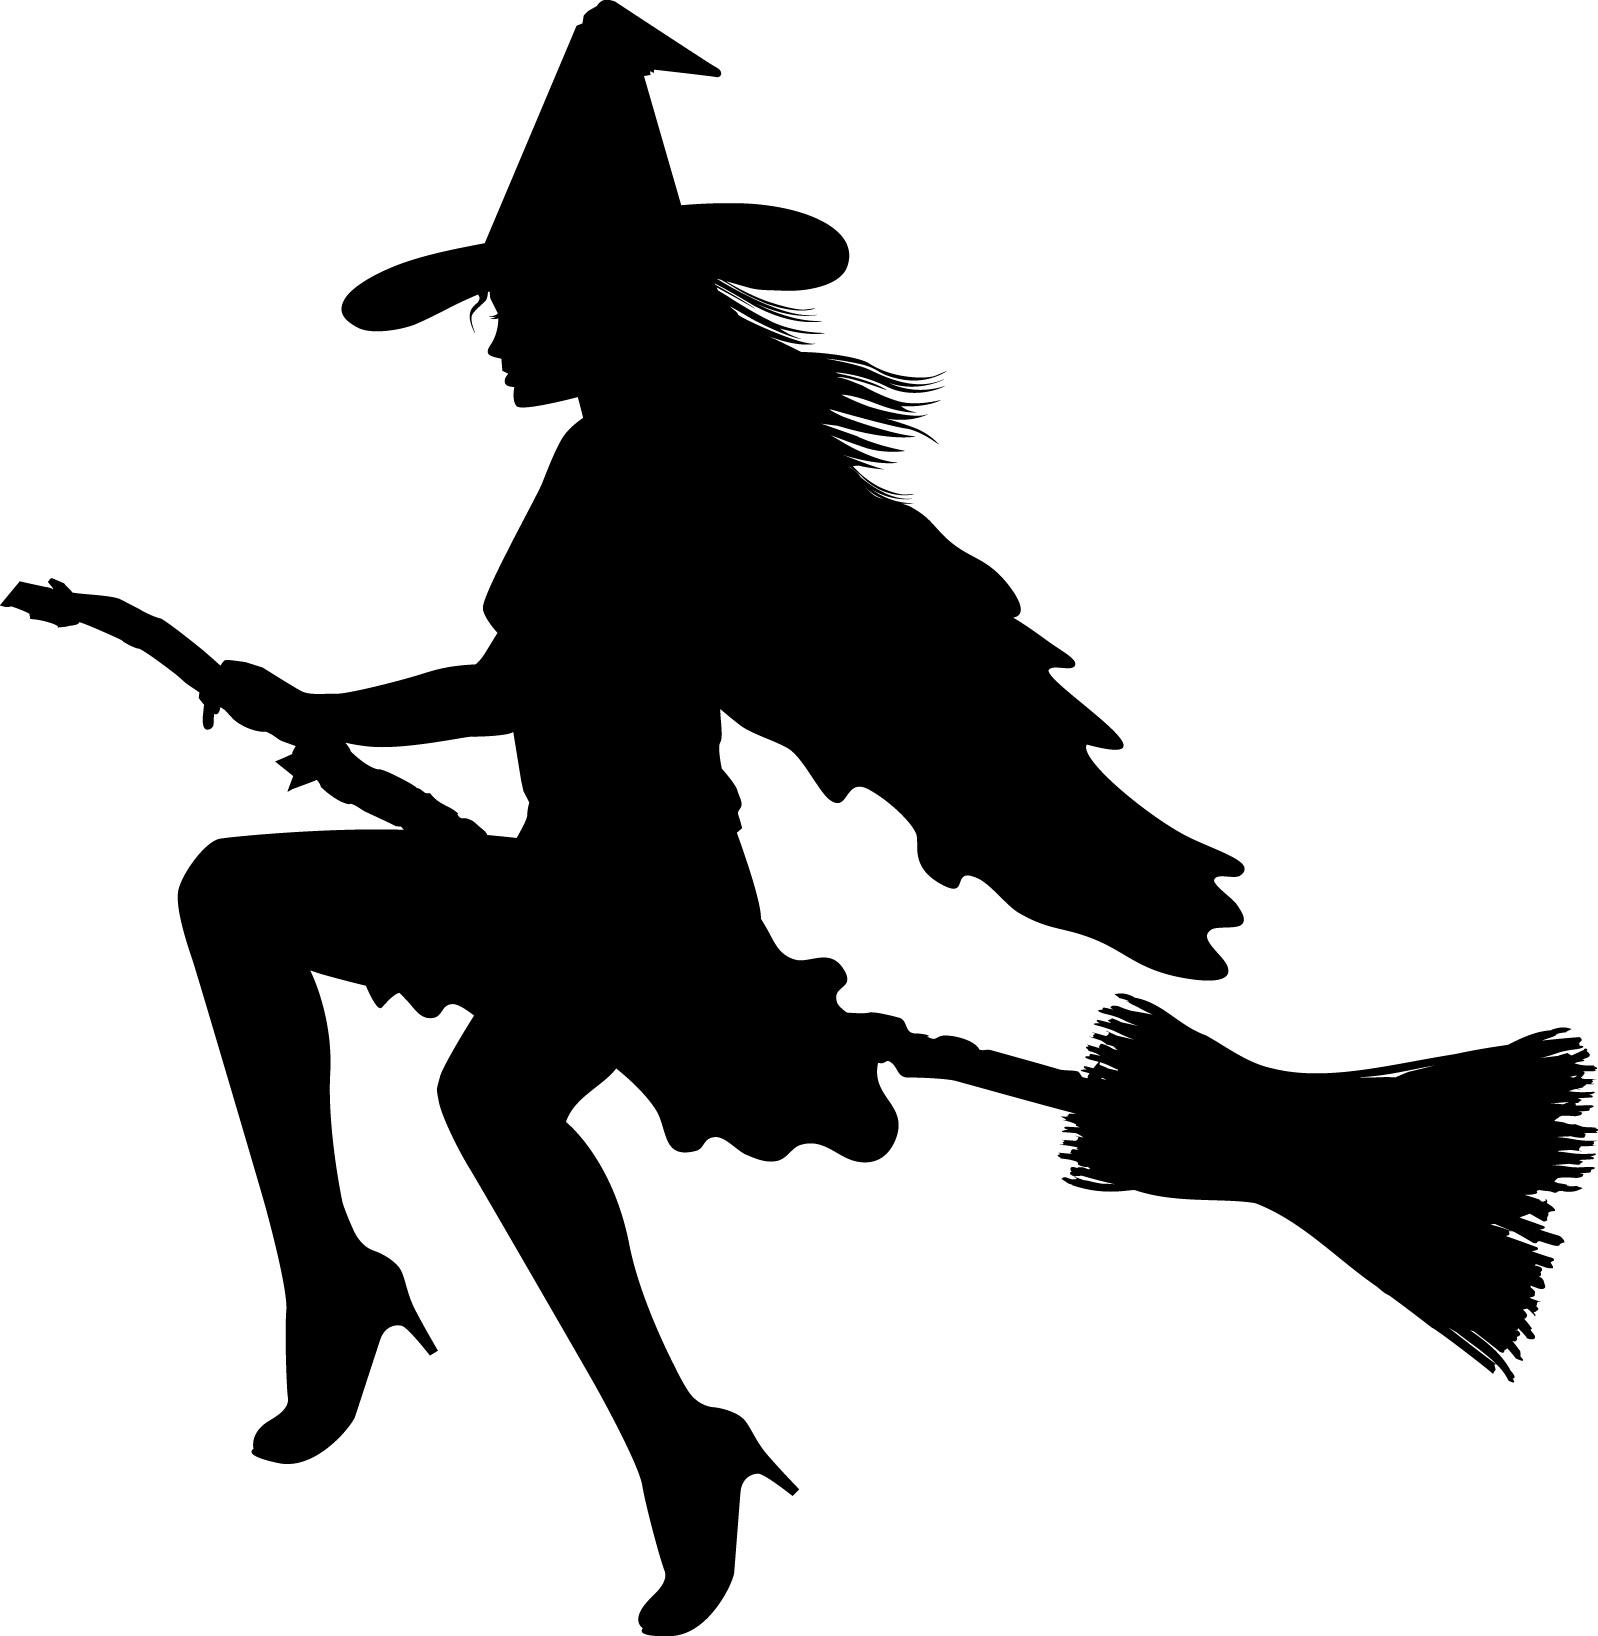 Картинки на хэллоуин черно белые, яндекс рабочий